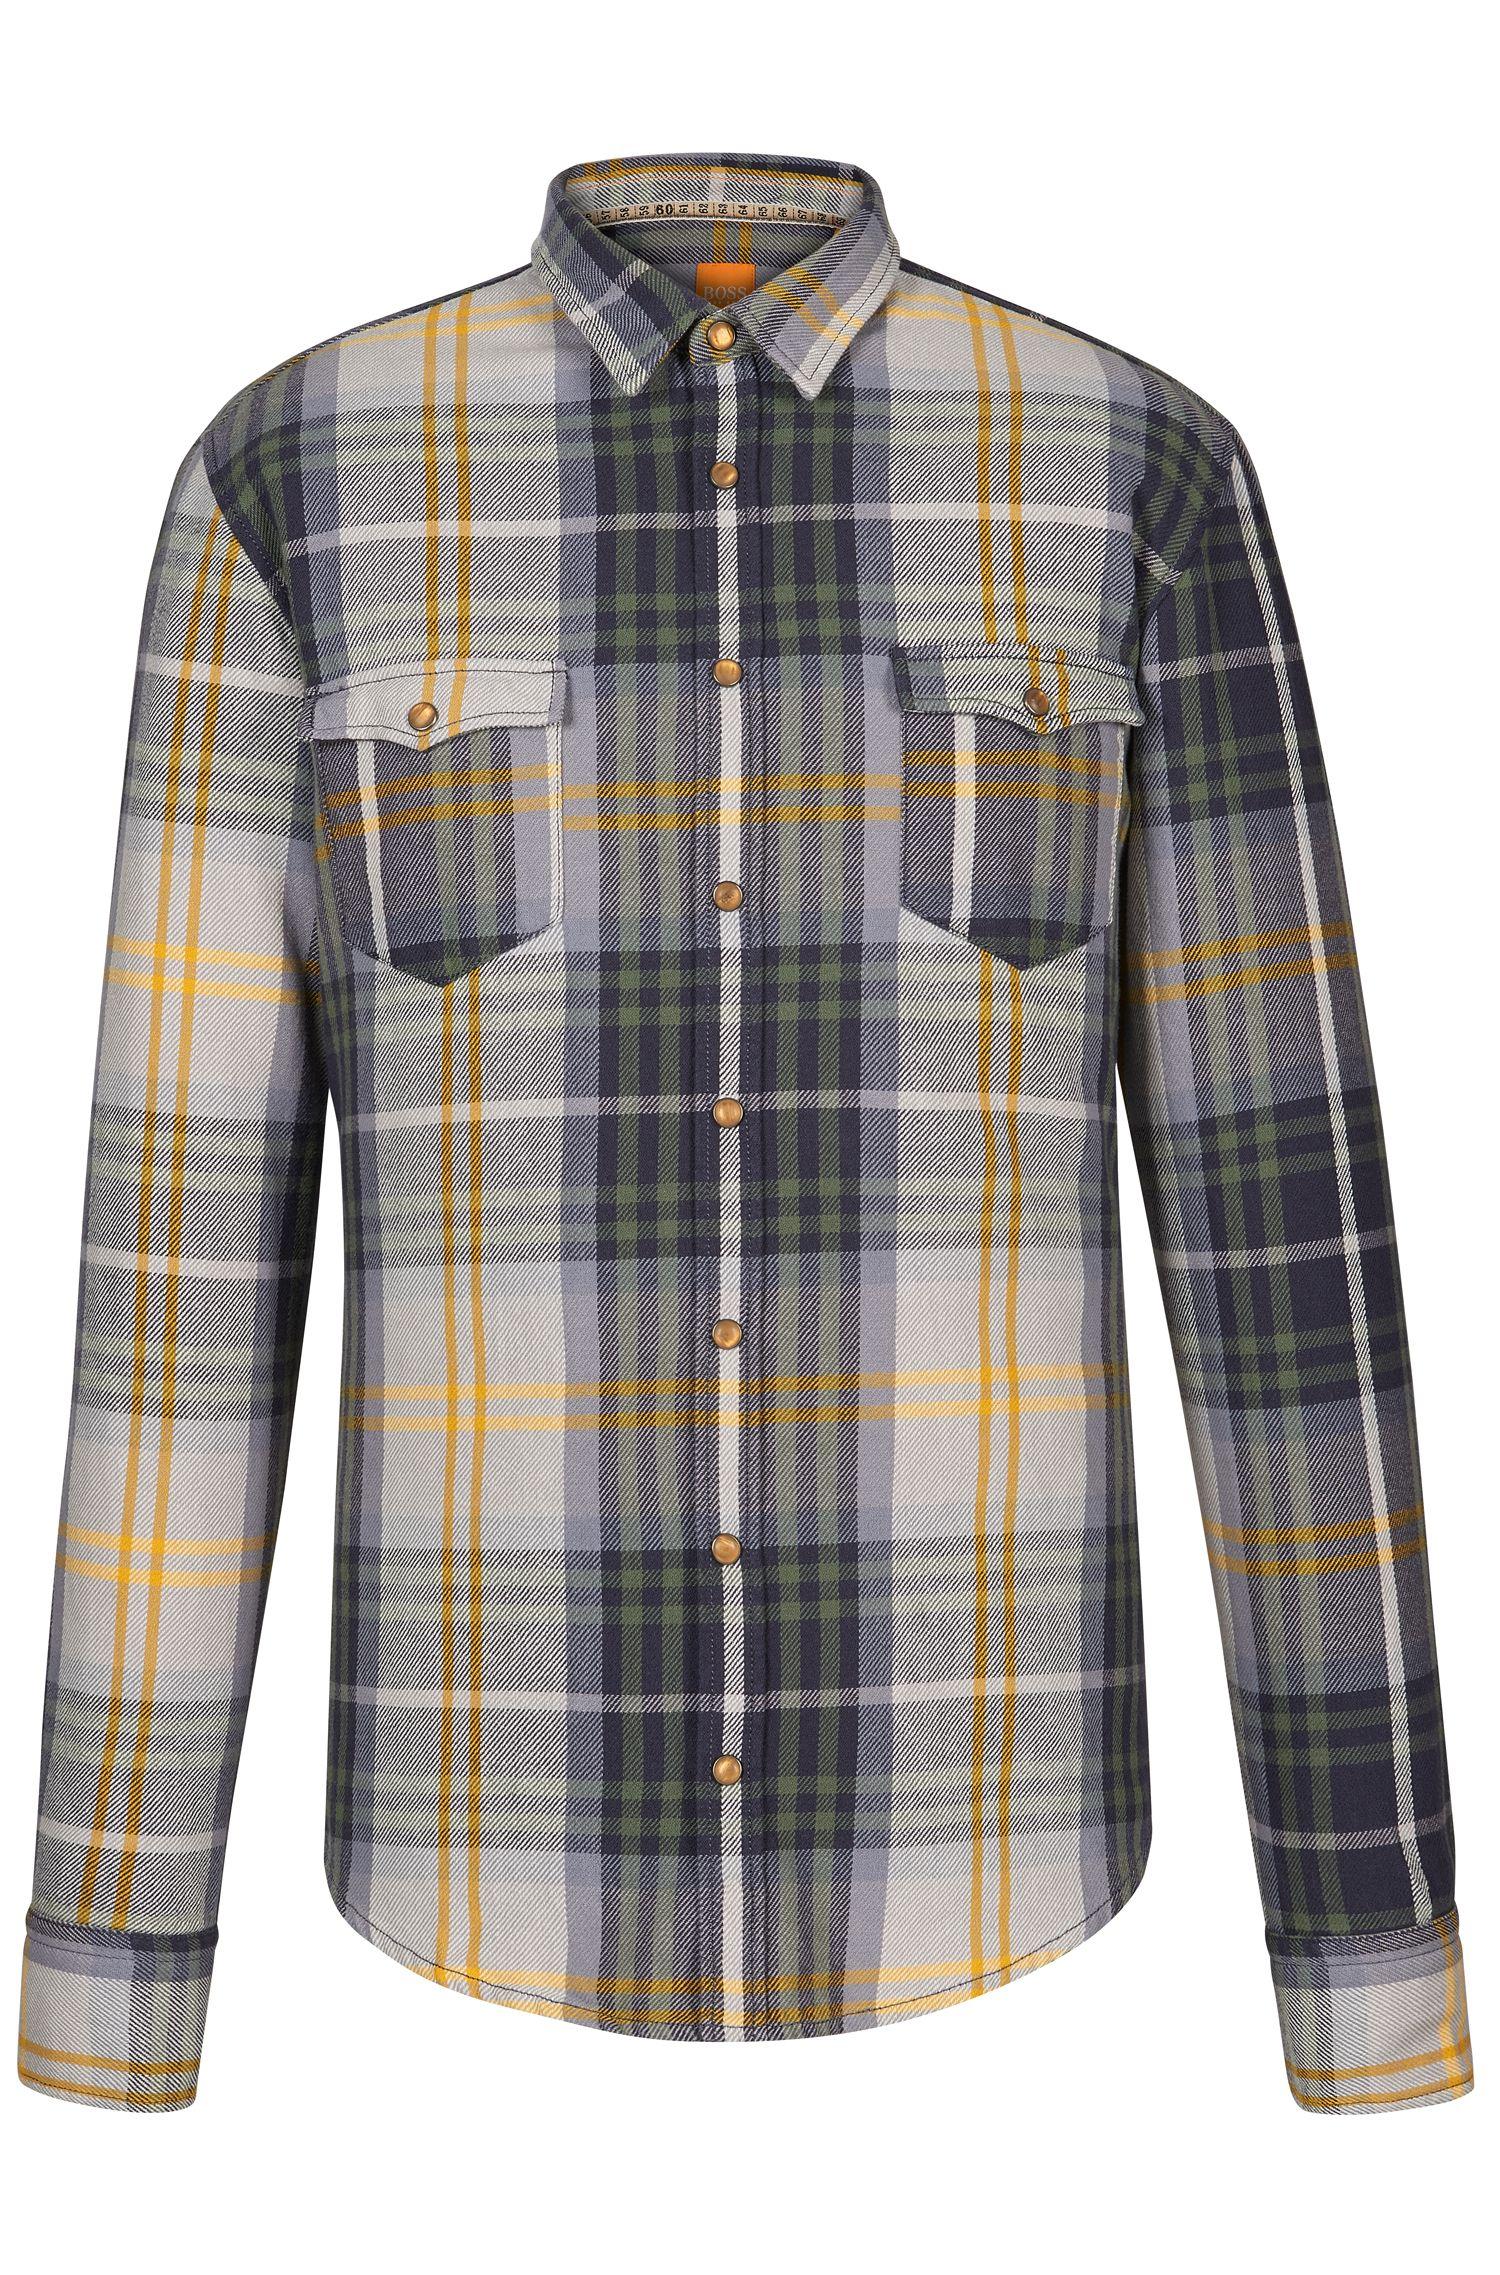 'EdoslimE' | Slim Fit, Plaid Cotton Button Down Shirt